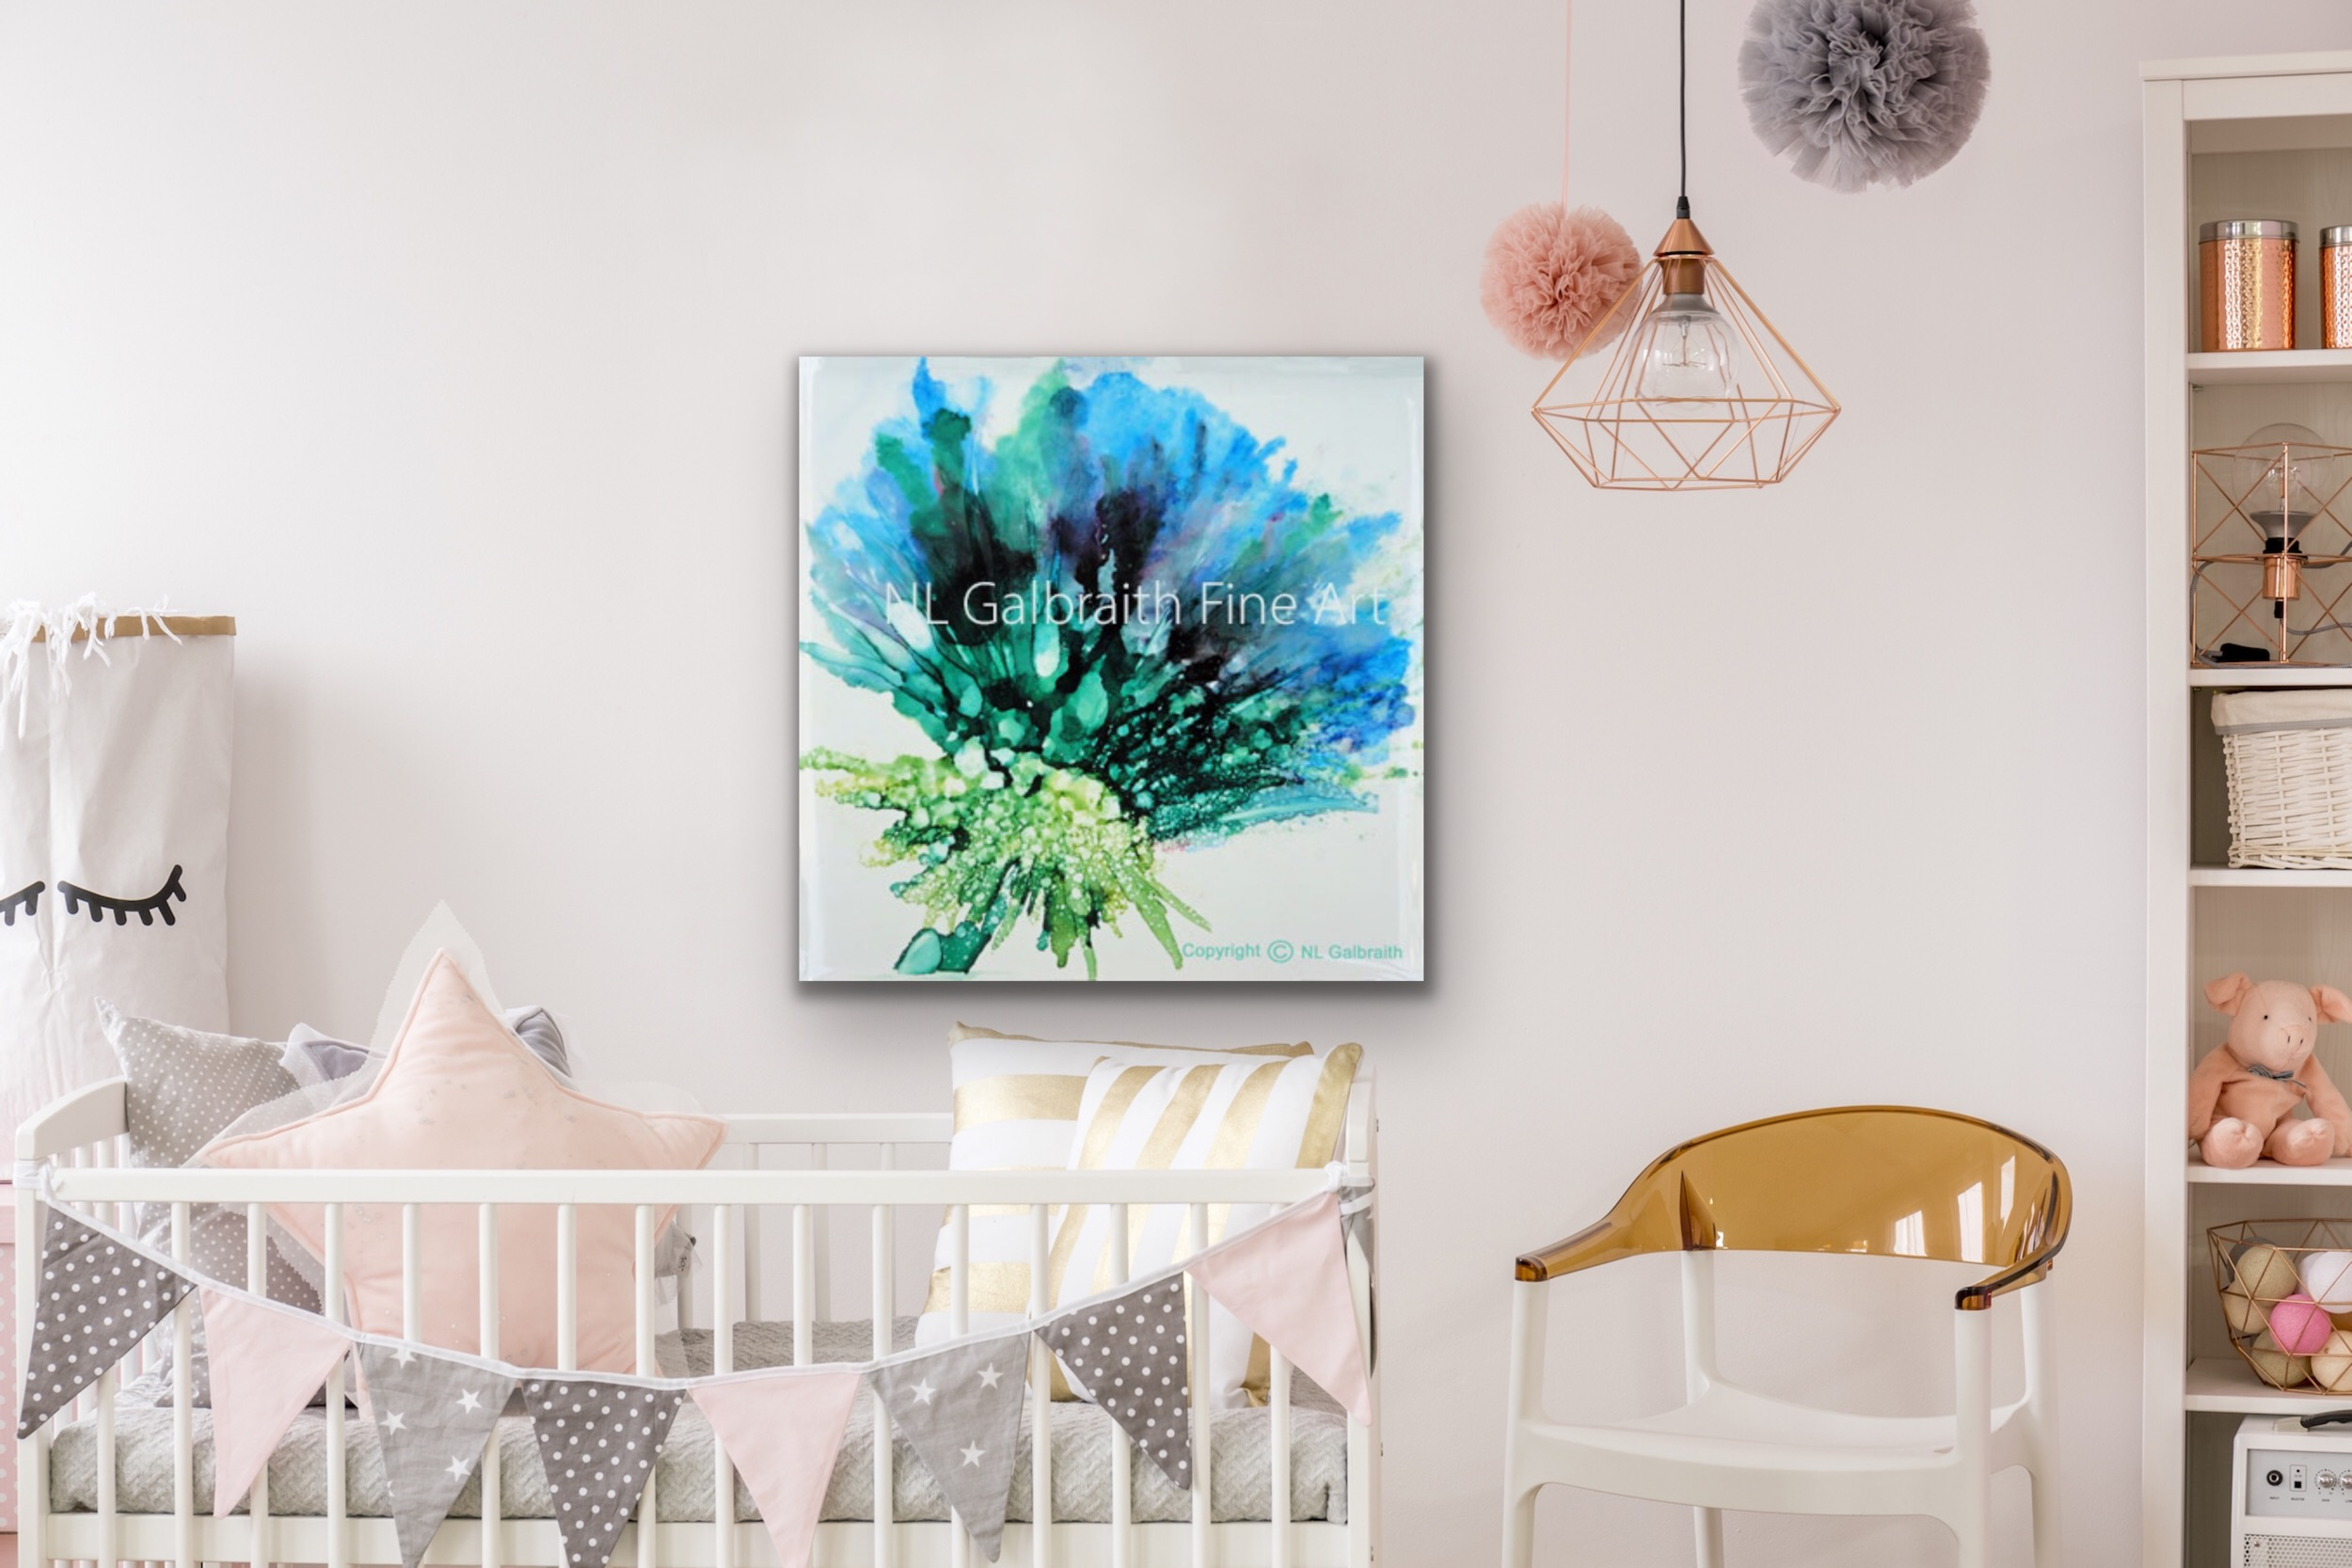 Medium blue Green Flower in a Nursery